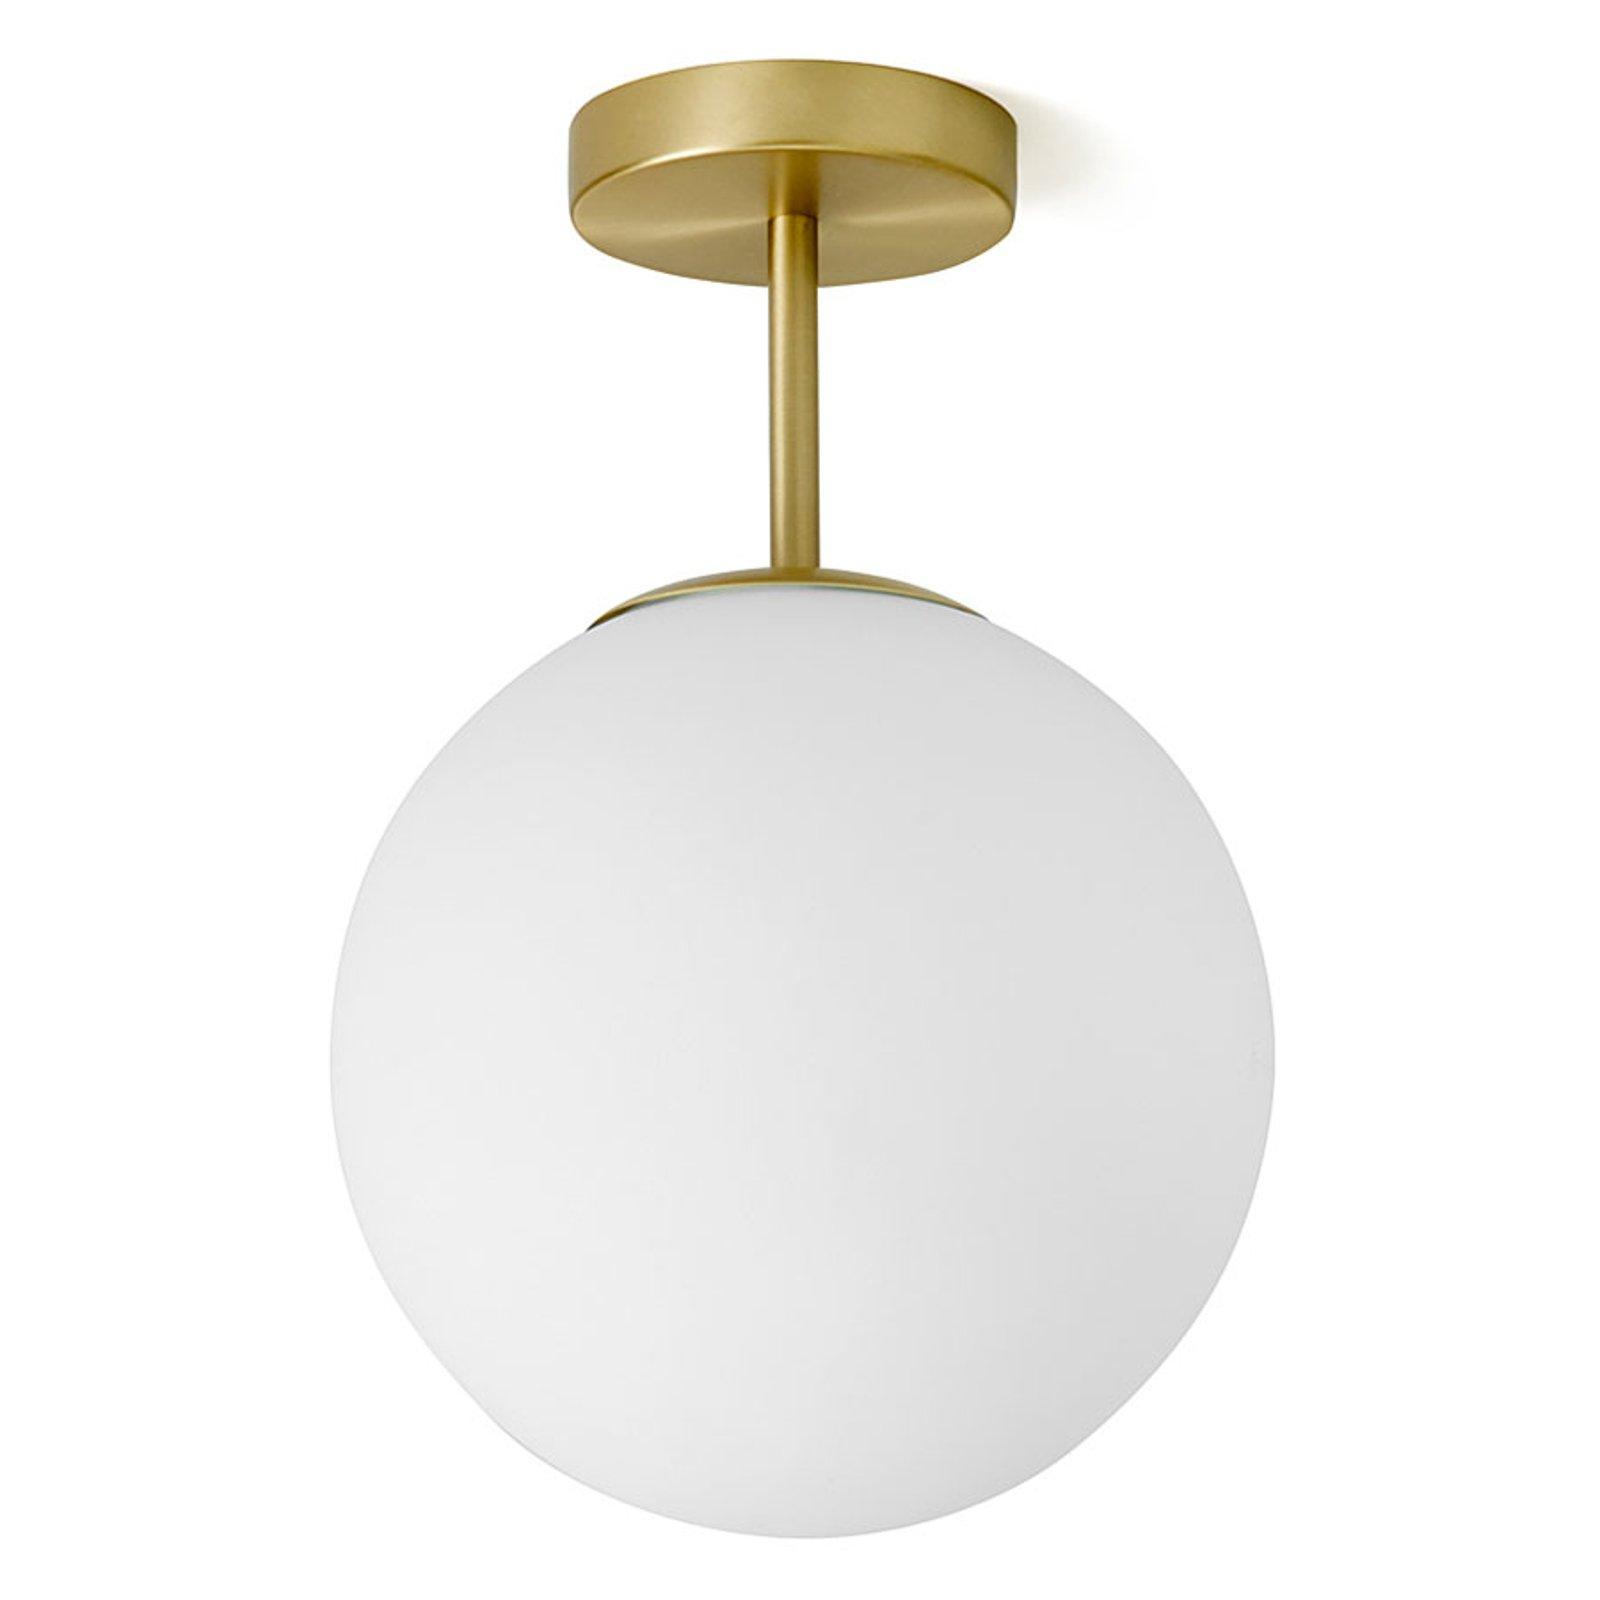 Messing-taklampe Jugen 1 lyskilde